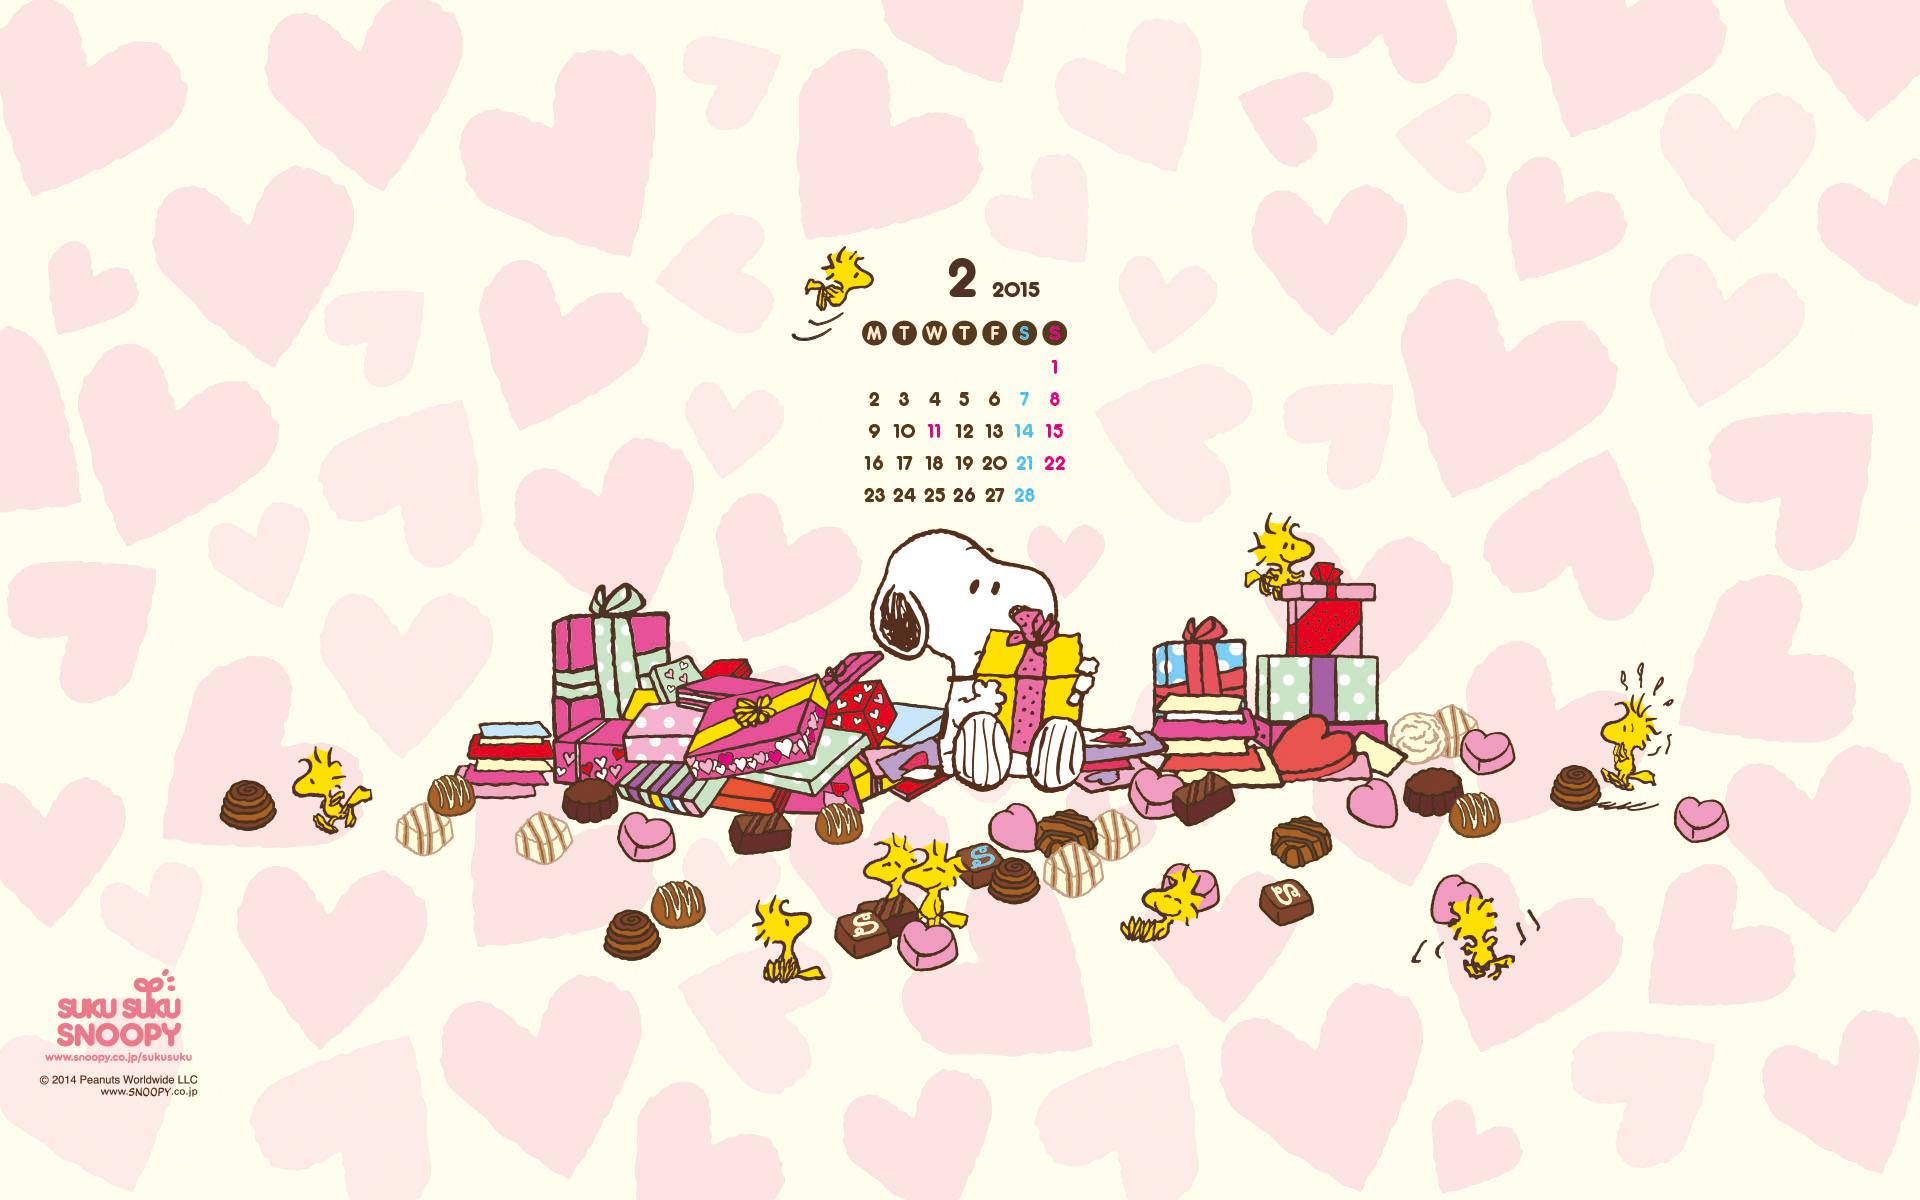 3 Snoopy February 2015 Wallpaper Calendar 1911 Peanut Snoopy 1920x1200